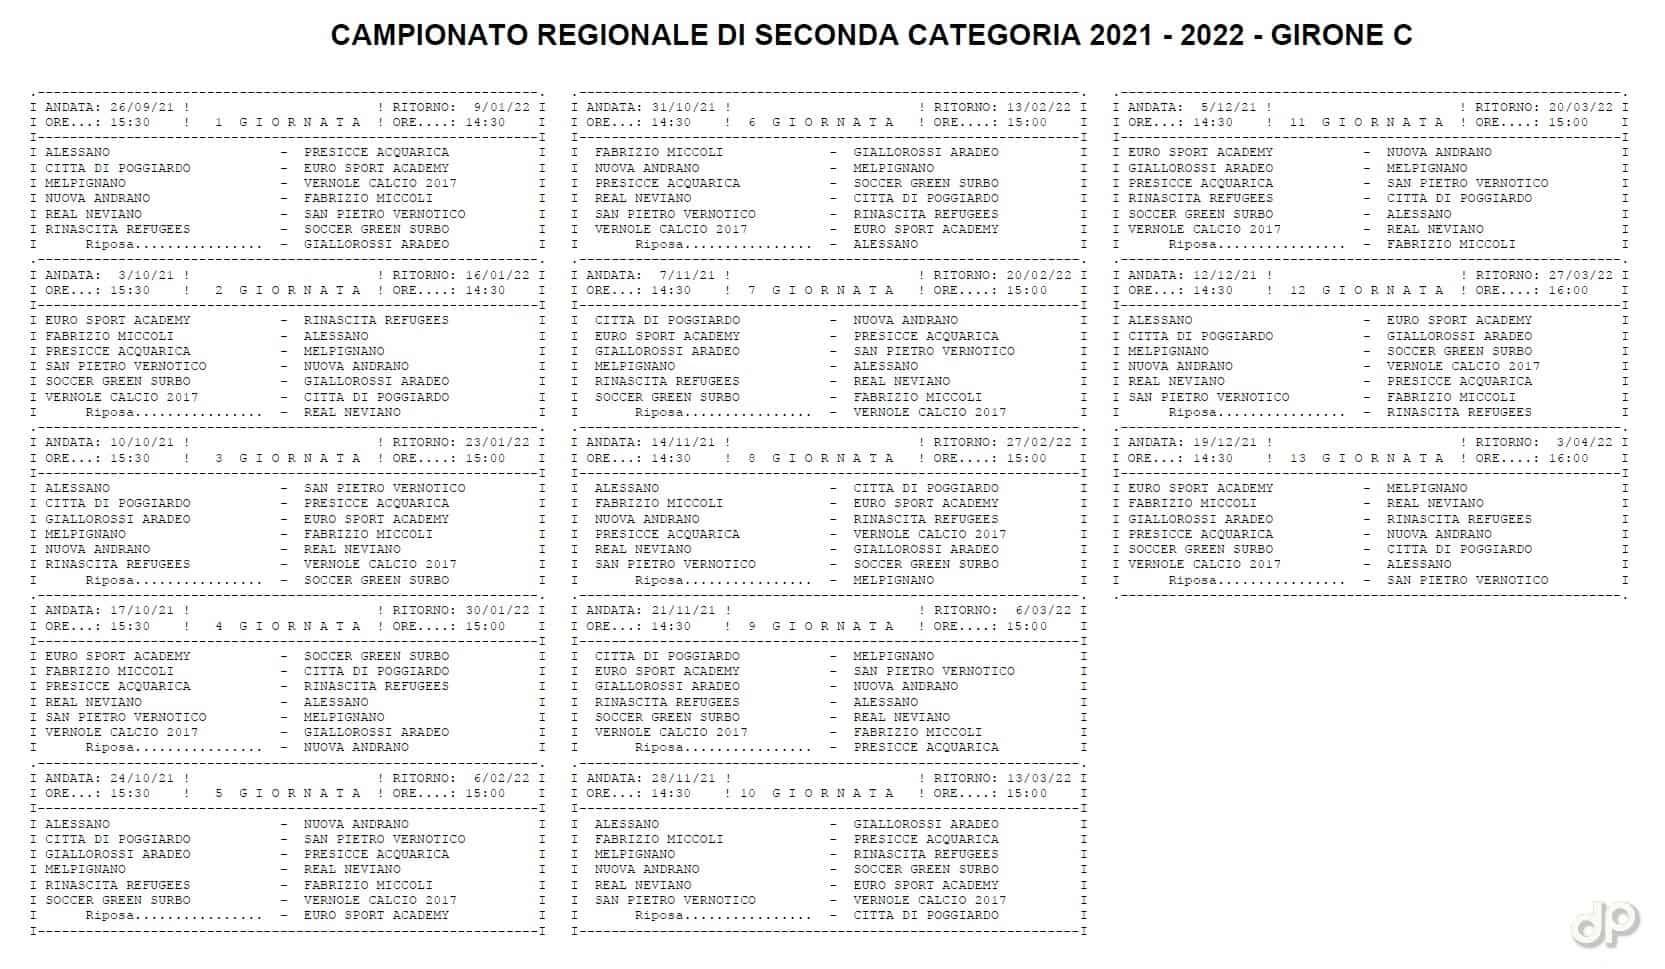 Calendario Seconda Categoria pugliese girone C 2021-22